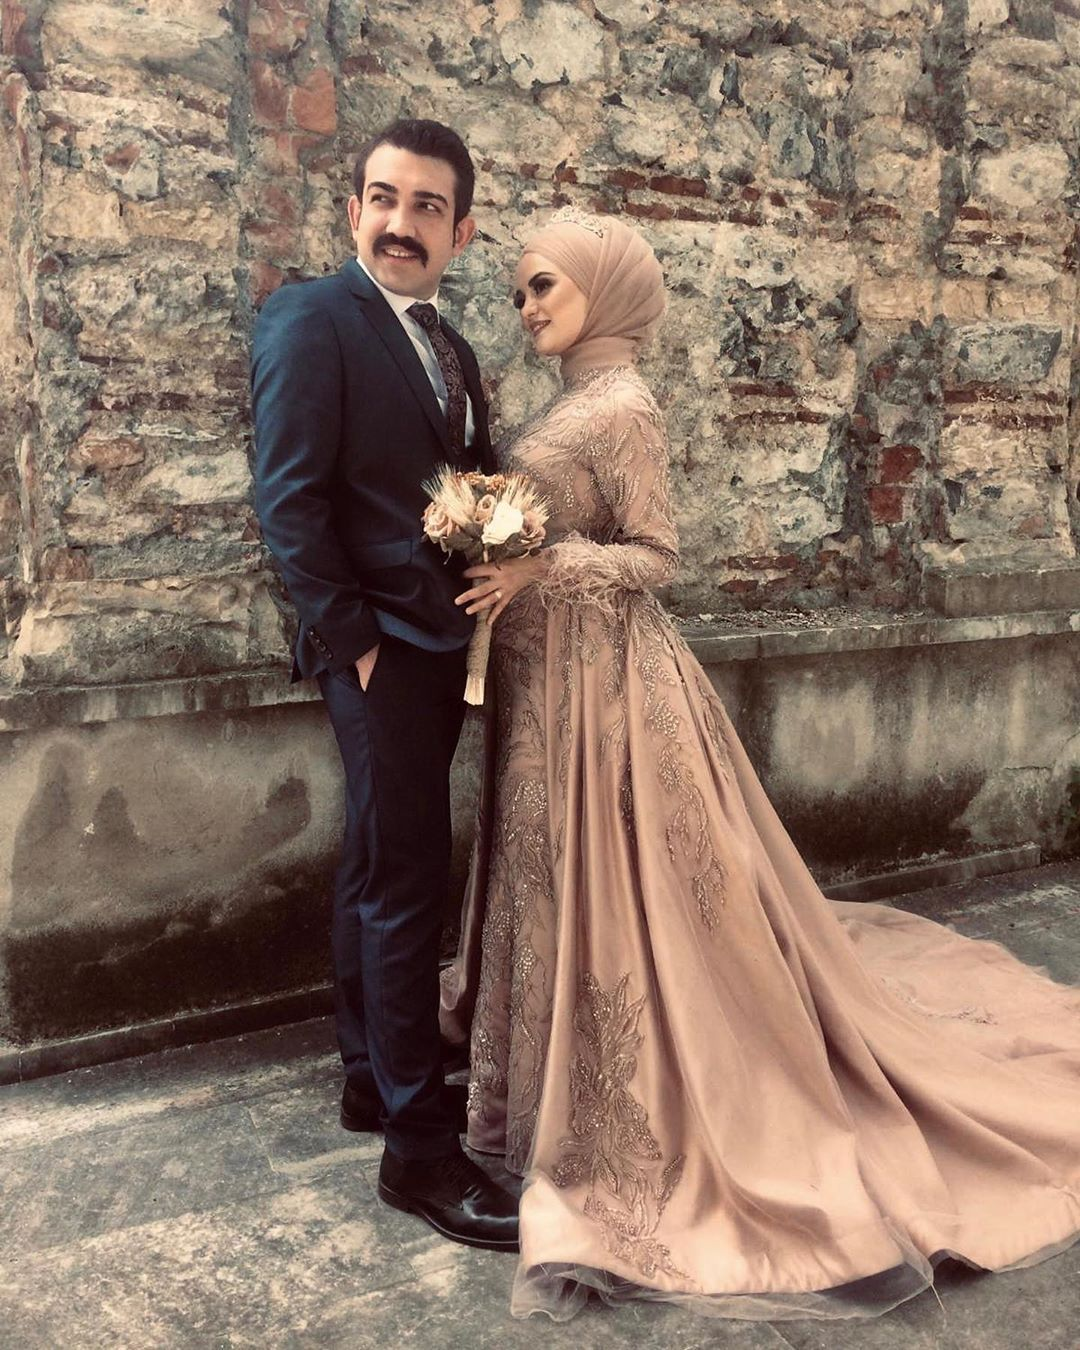 Goruntunun Olasi Icerigi 2 Kisi Ayakta Duran Insanlar Ve Dugun Wedding Dress Sleeves Hijab Wedding Dresses Long Sleeve Evening Dresses